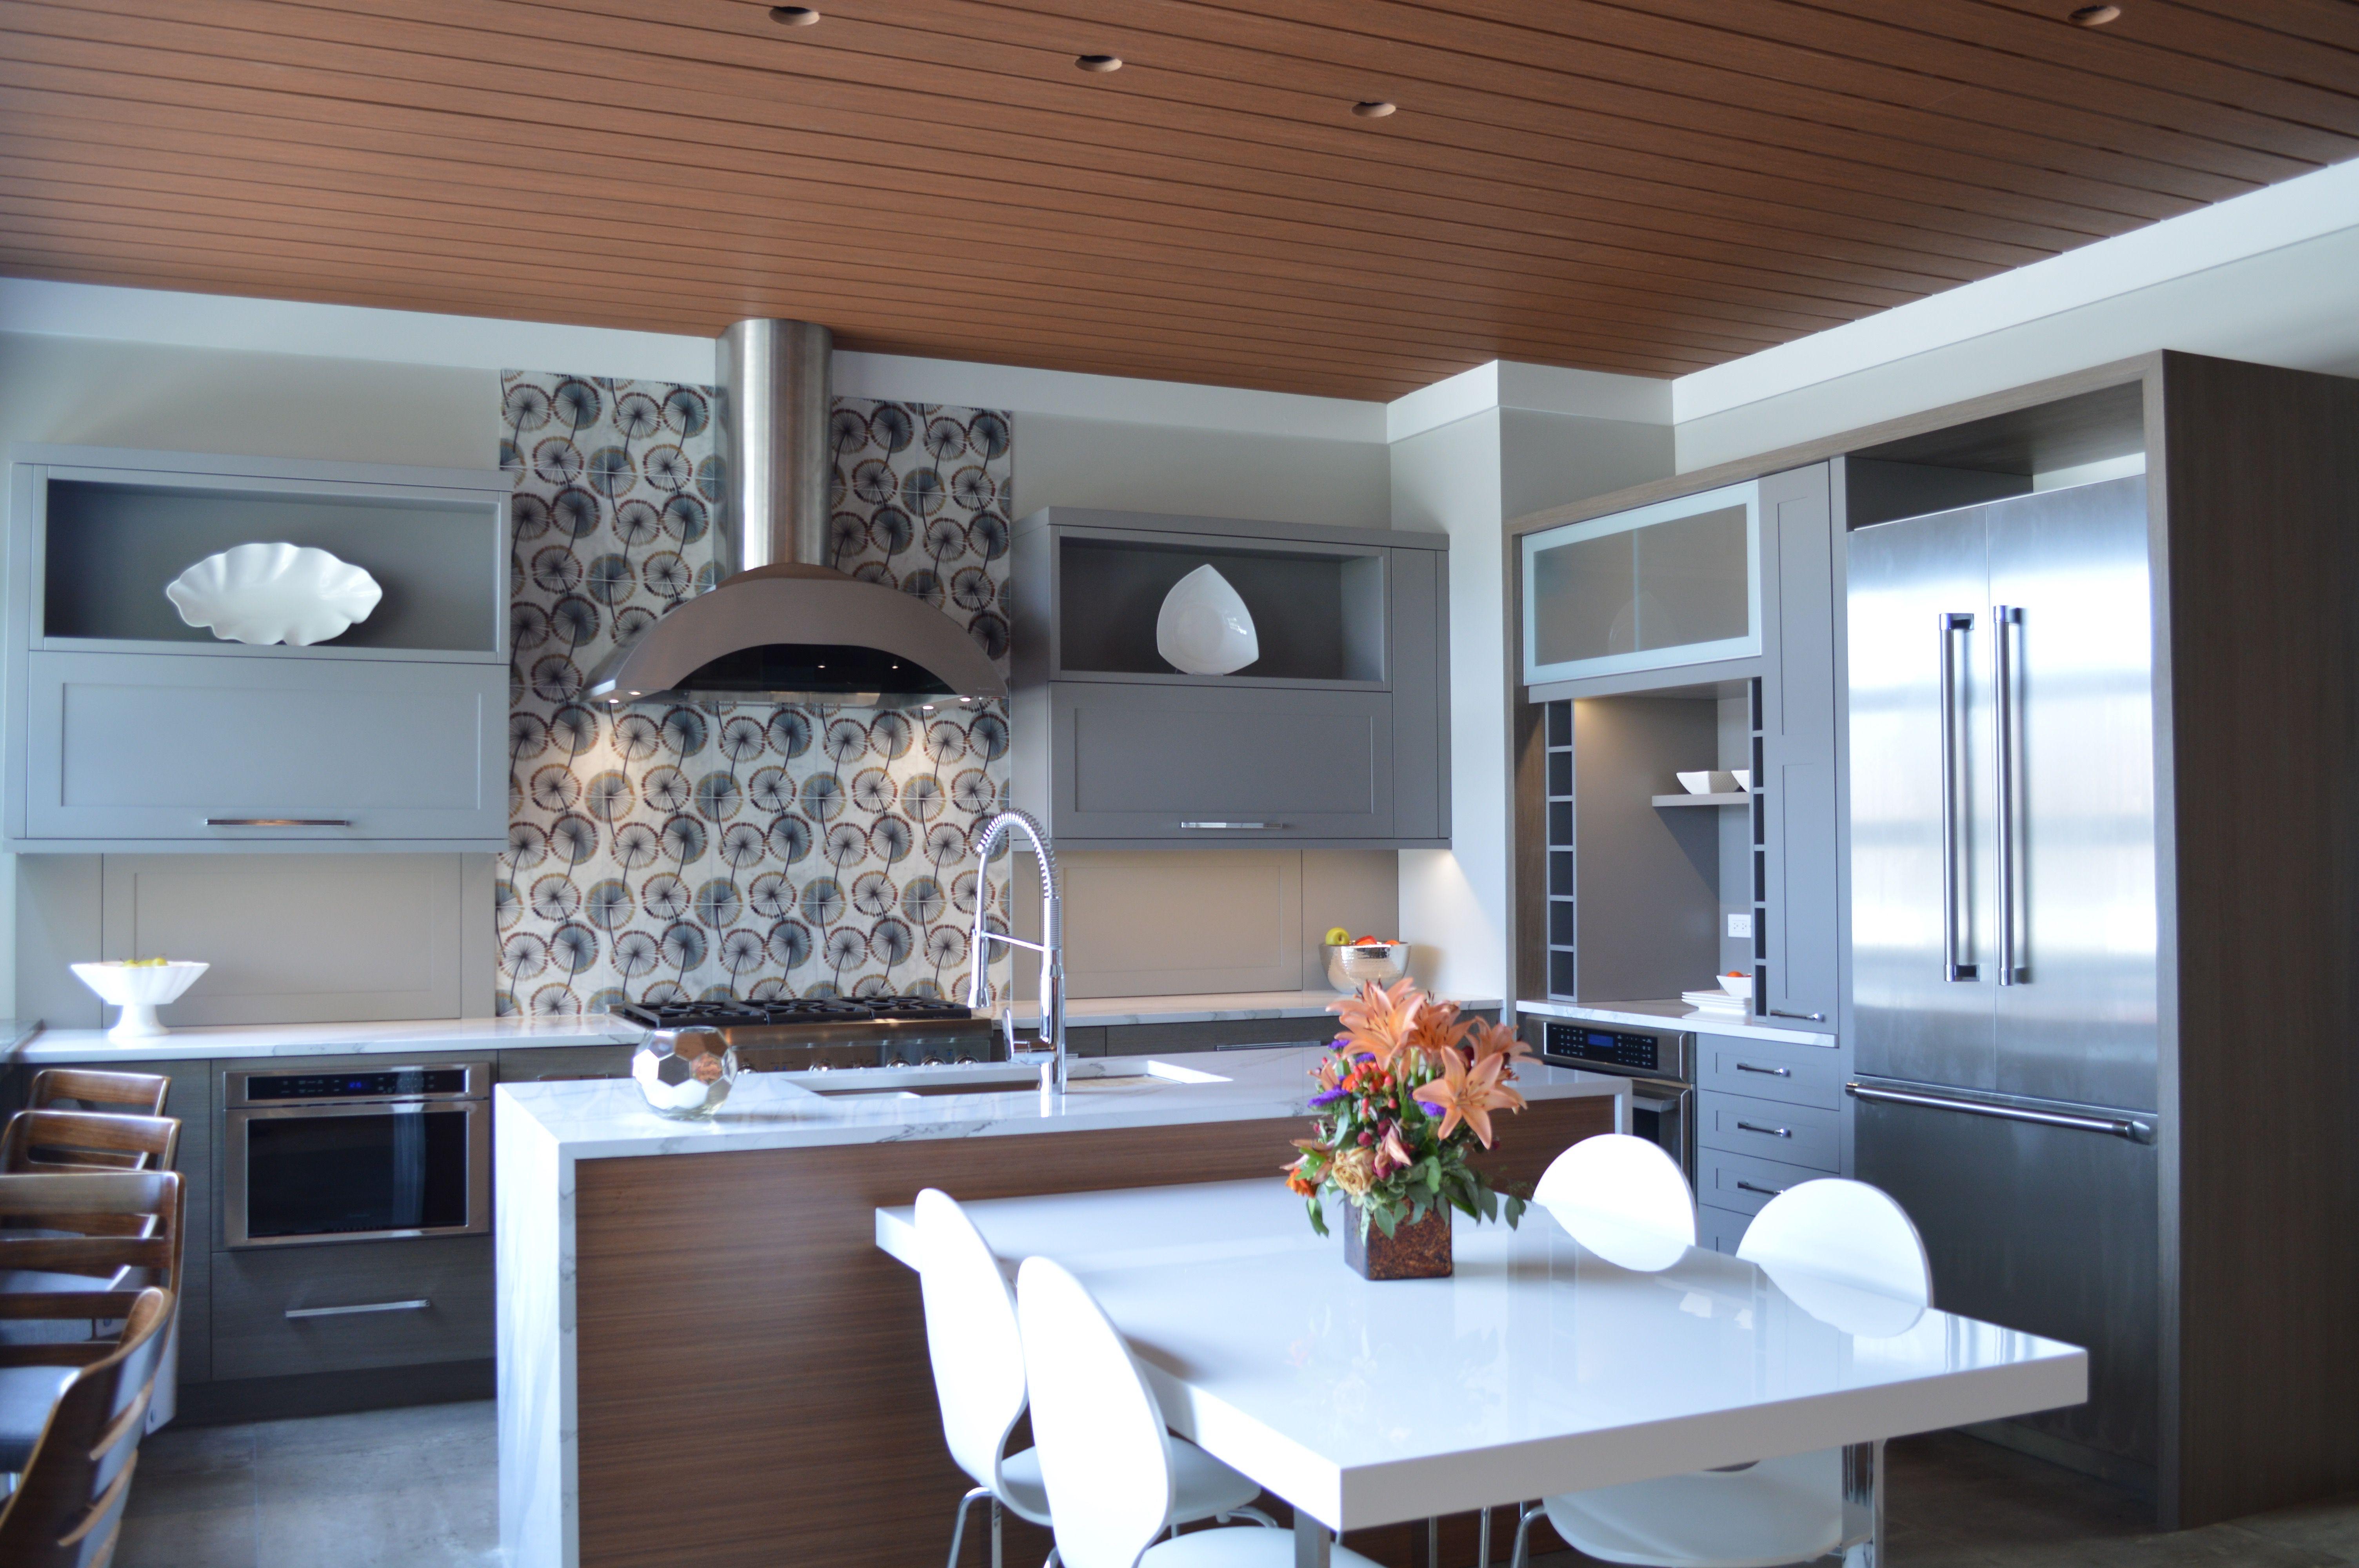 Kitchen Remodel Tile Floors White Kitchen Cabinets Gray Kitchen Cabinets Quartz Countertops Open Design Your Kitchen Kitchen Remodel Grey Kitchen Cabinets